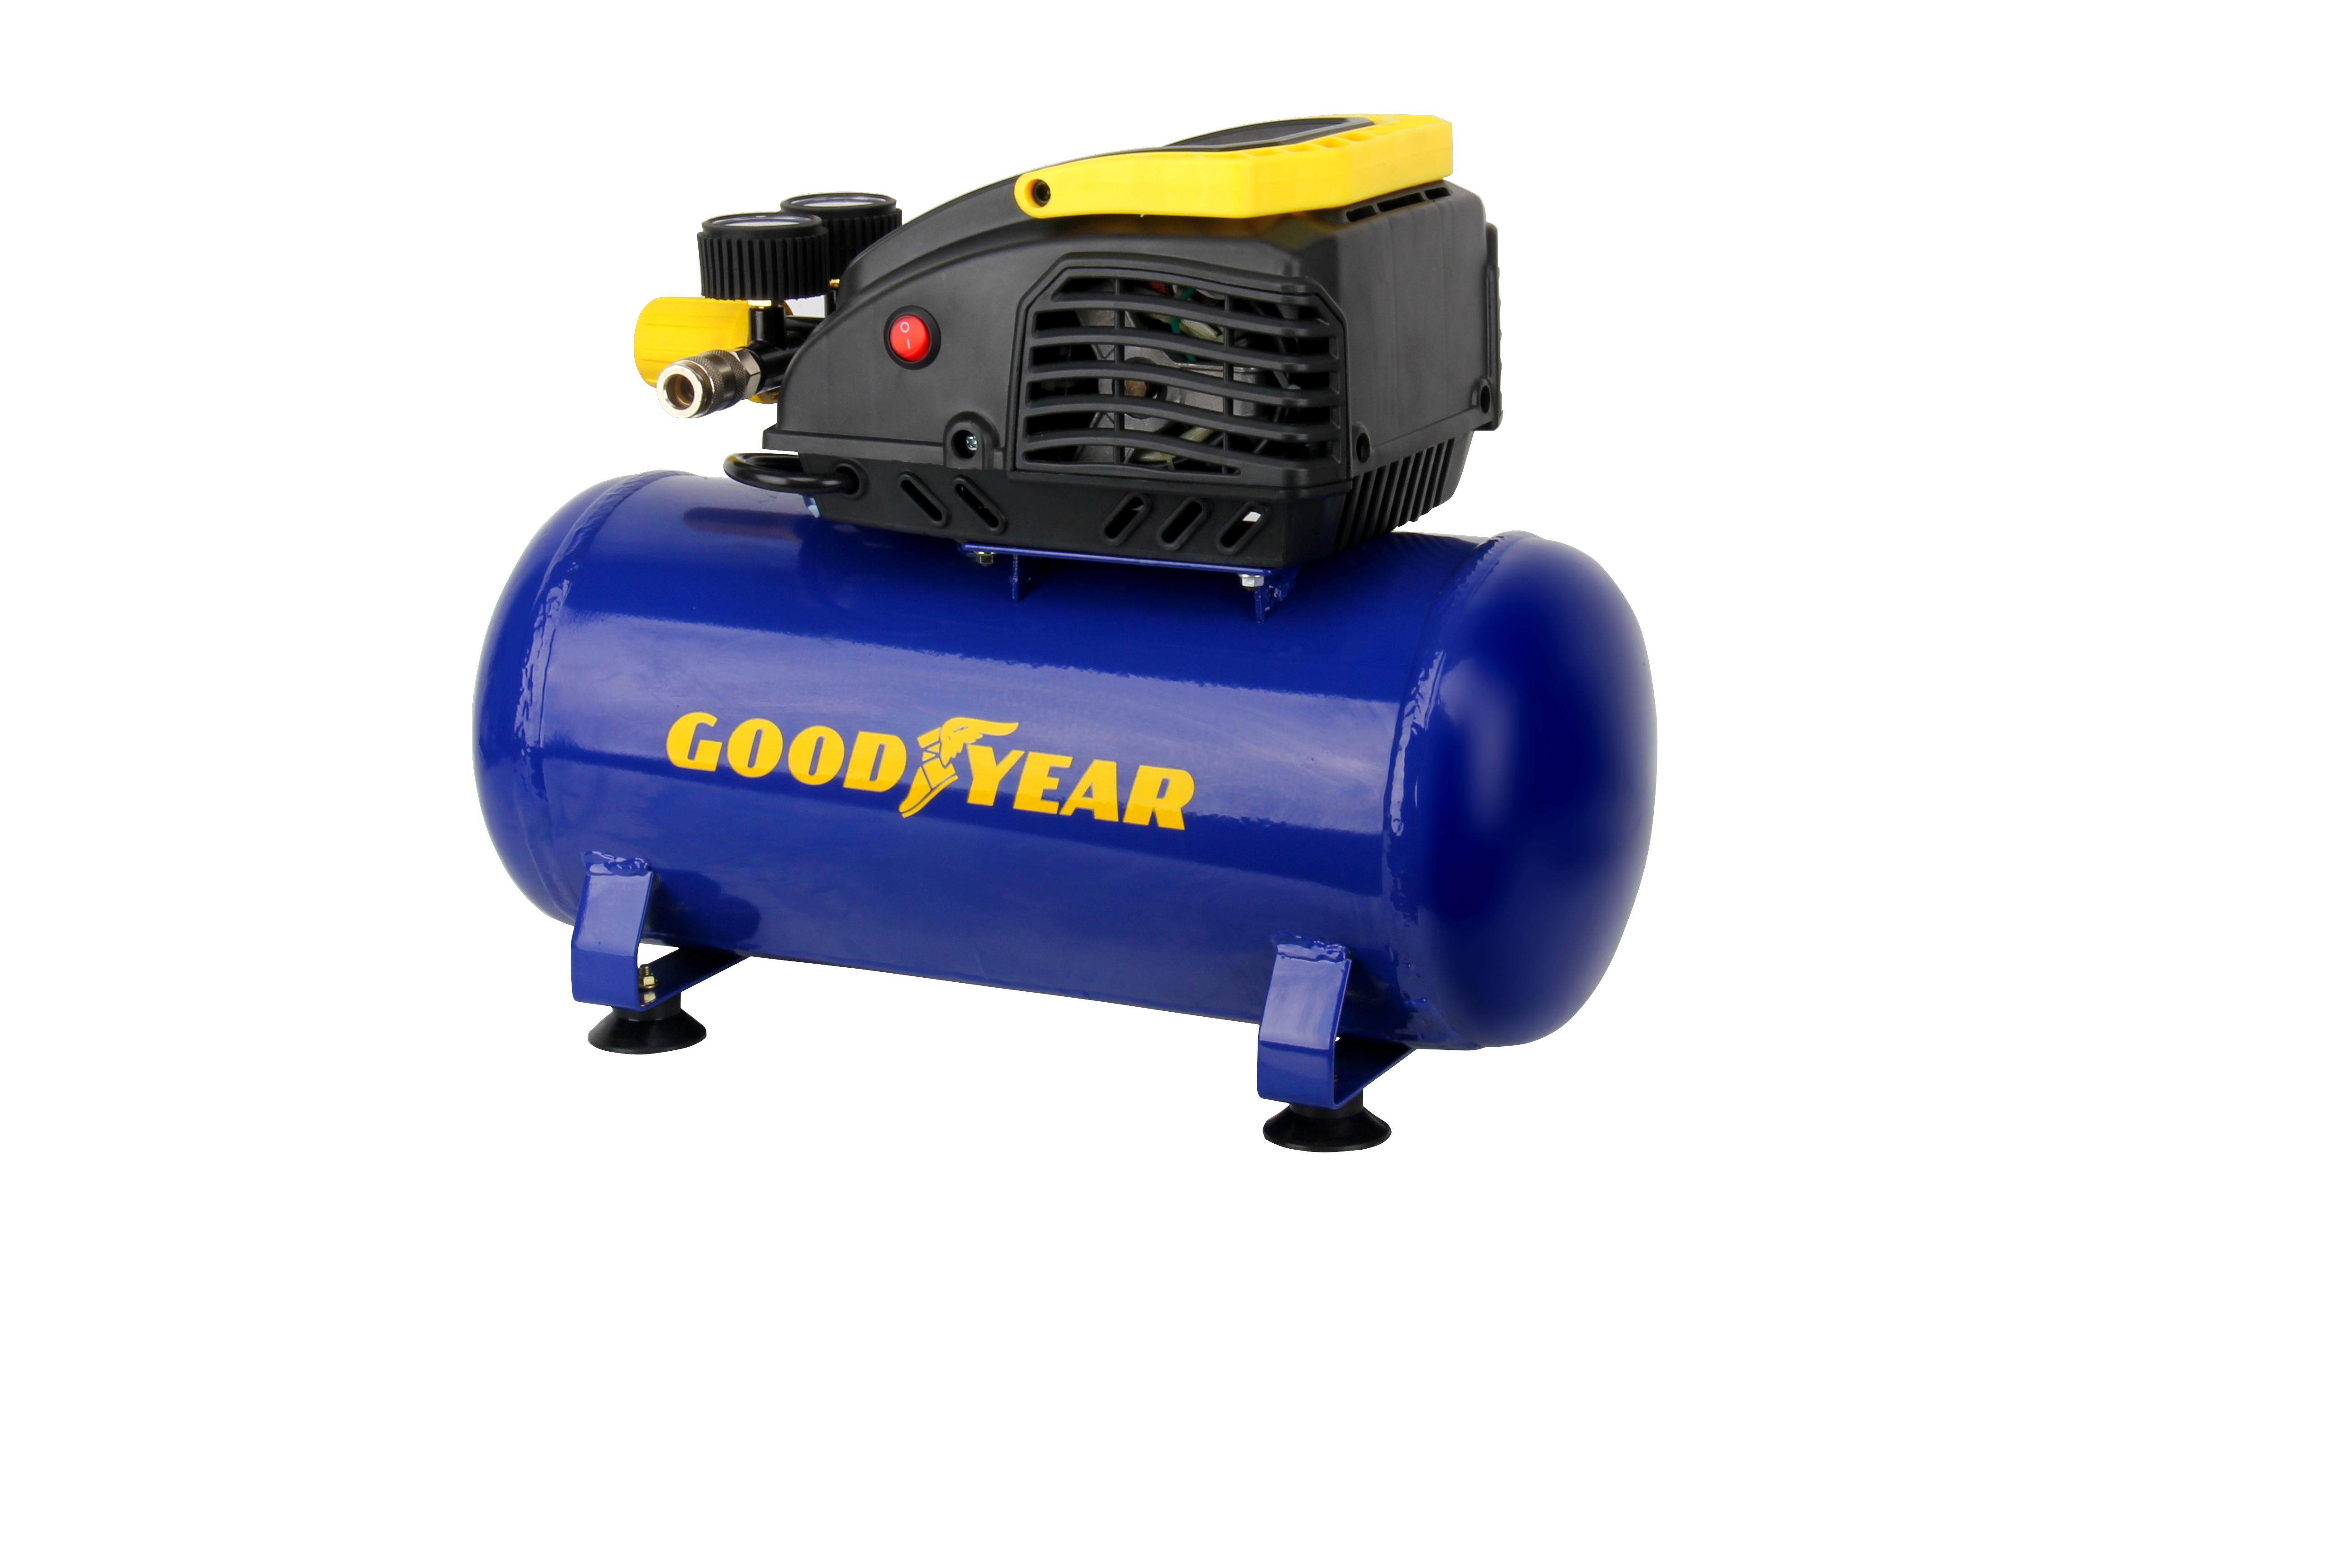 Goodyear 3-Gallon Air Compressor